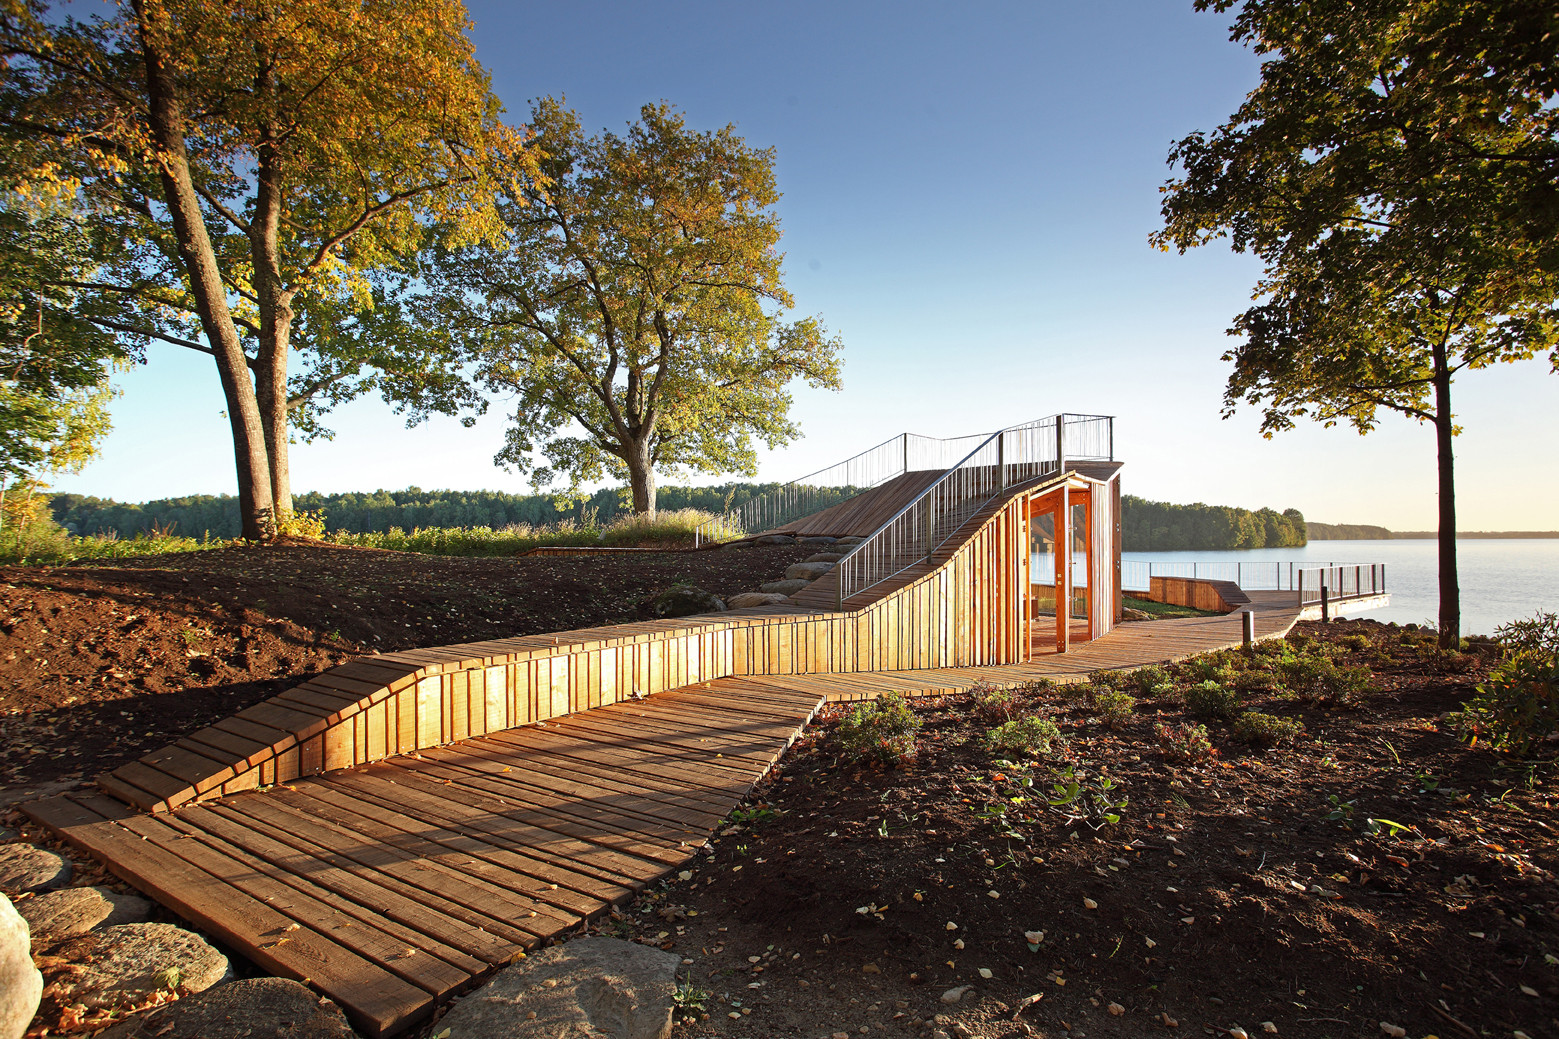 View Terrace and Pavilion / Didzis Jaunzems  + Laura Laudere  + Jaunromans and Abele , © Maris Lapins